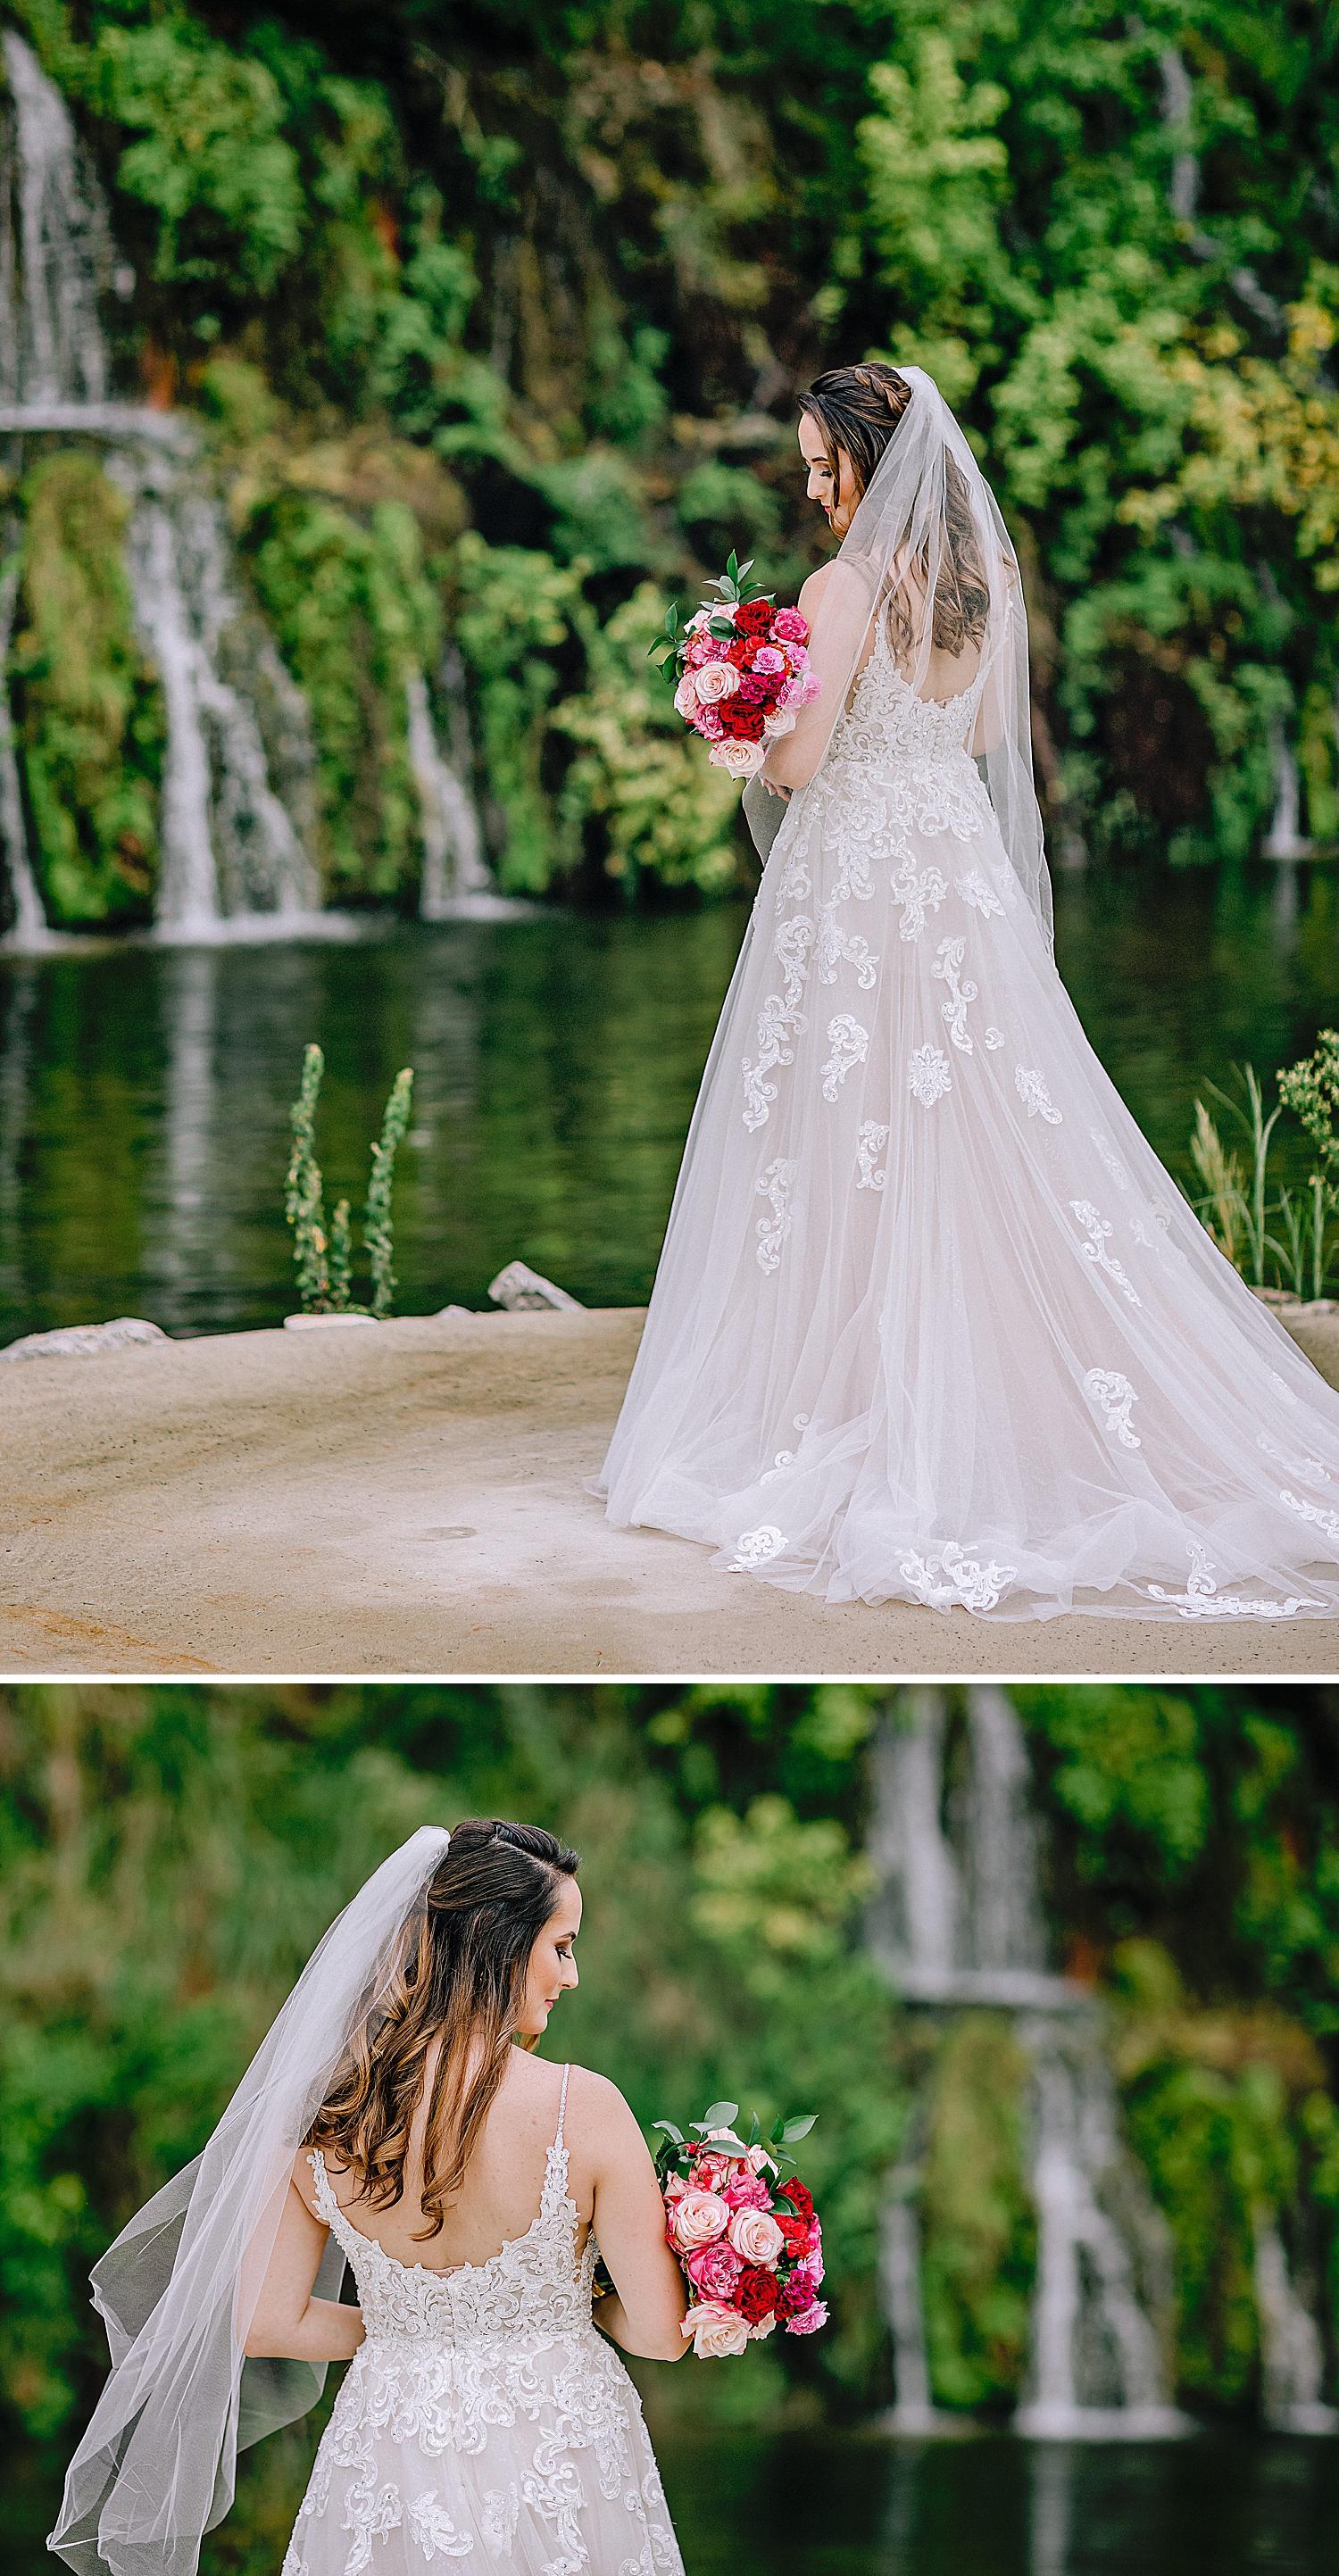 Carly-Barton-Photography-Bridal-Photos-Remis-Ridge-Hidden-Falls-New-Braunfels-Texas-Bride_0018.jpg